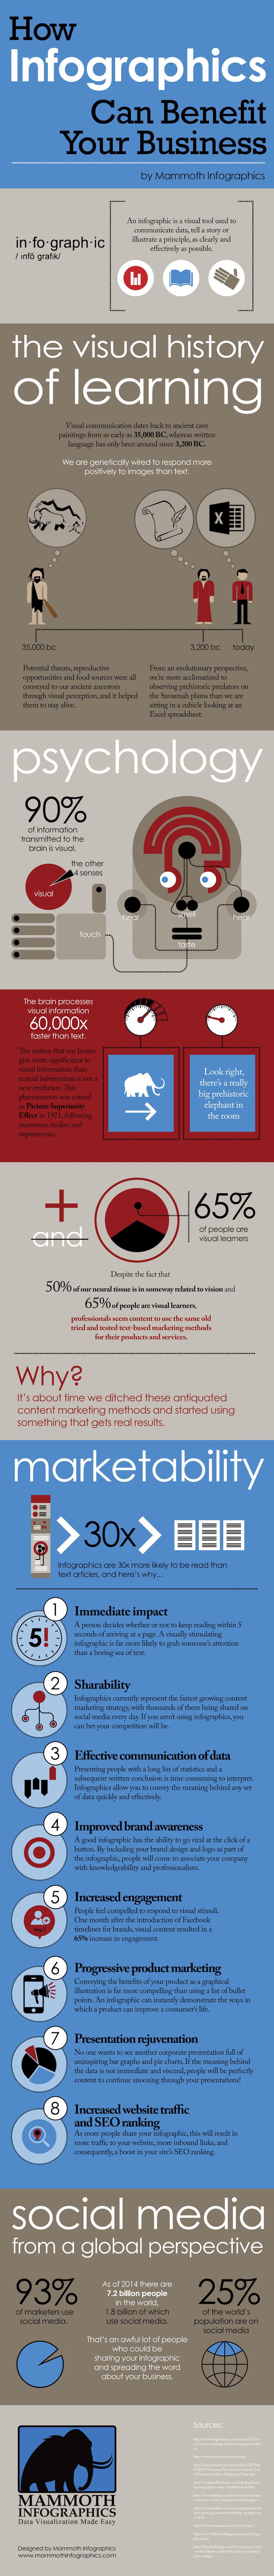 infographics, infographic, mammoth